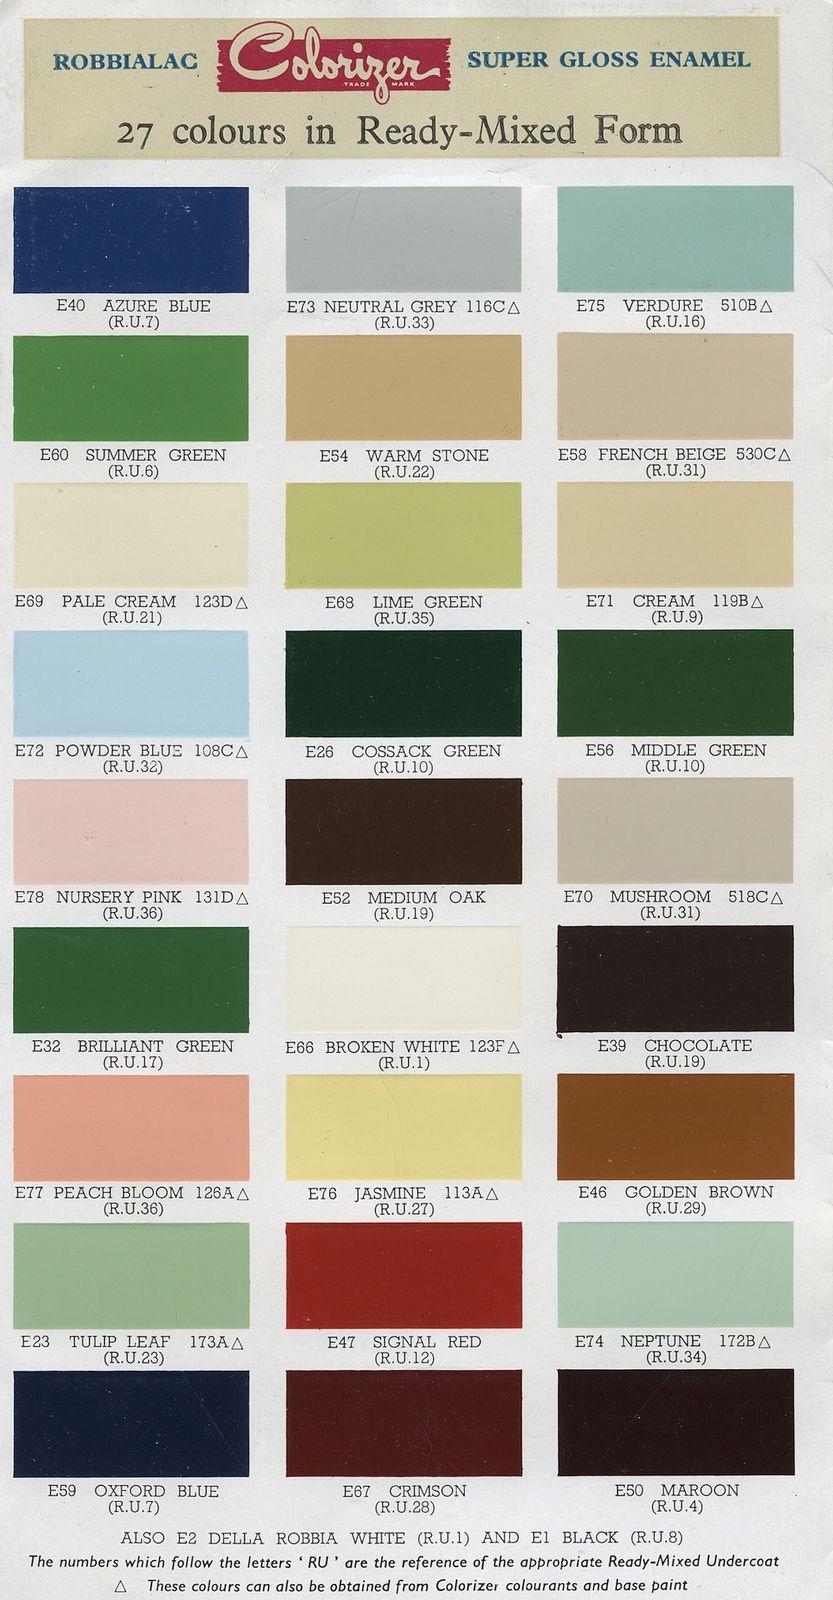 Robbialac Paint Brochure Super Gloss Enamel Green Paint Painting Colour Schemes